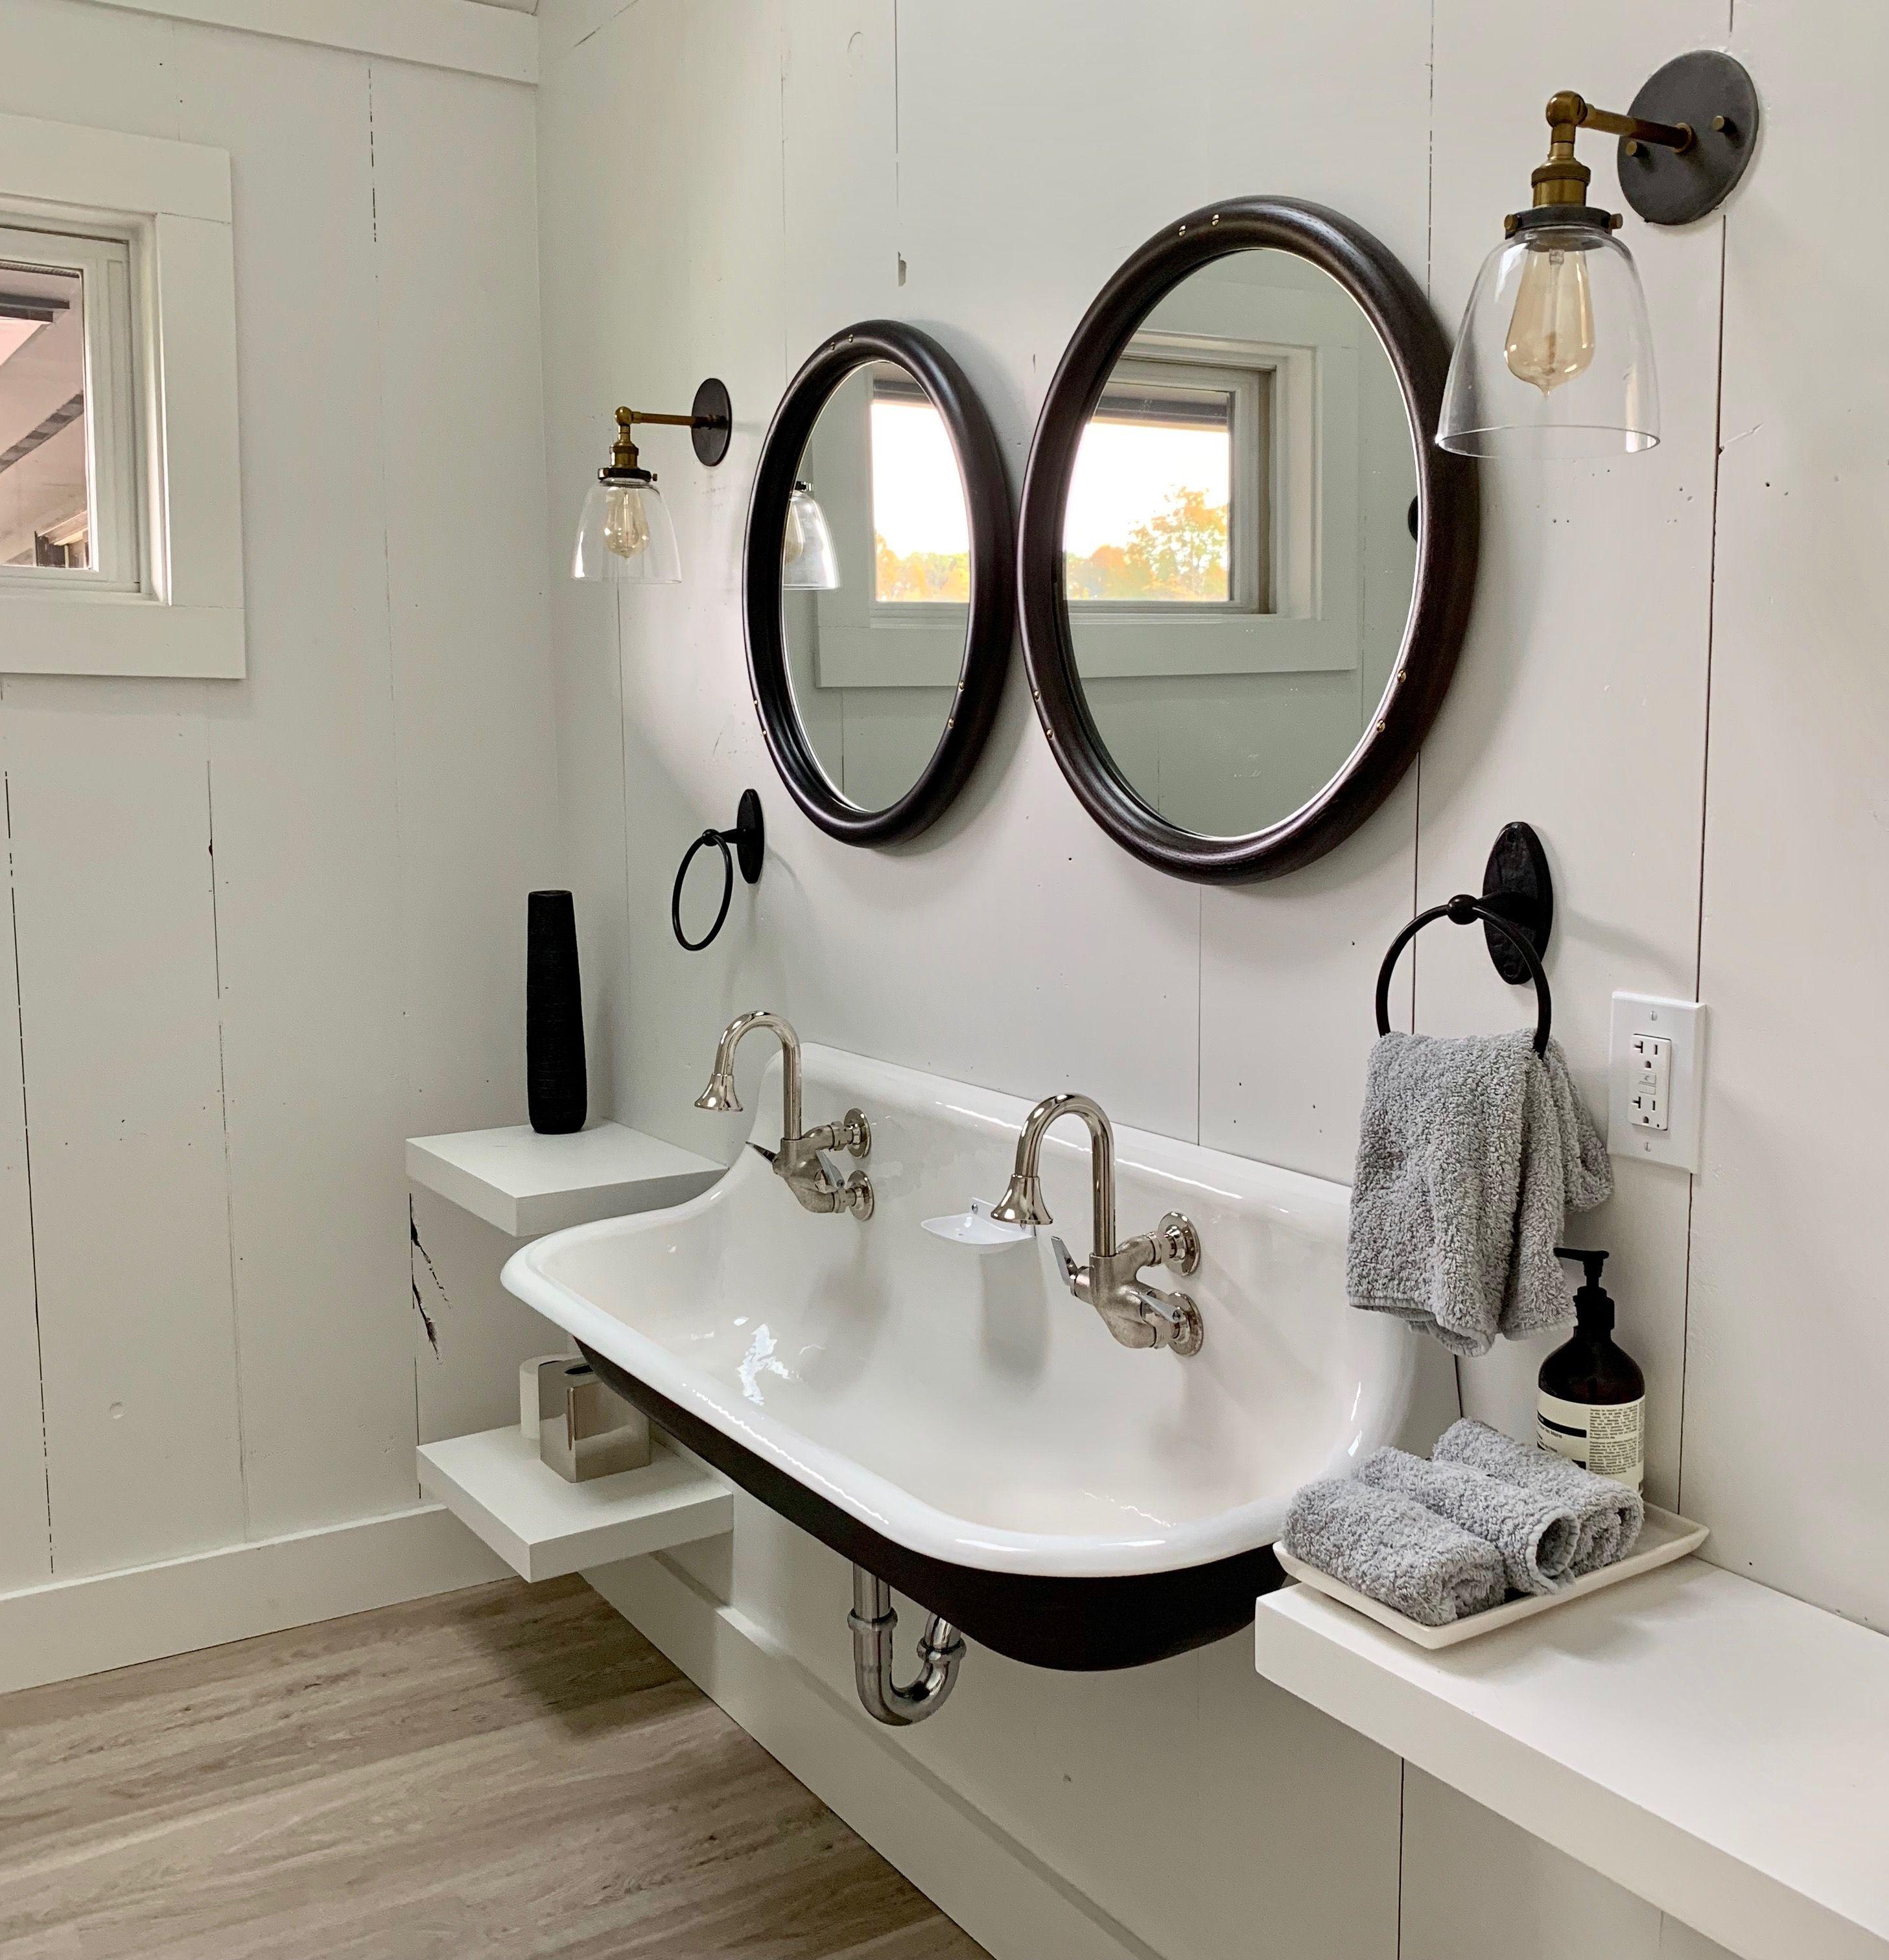 Modern Farmhouse Bathroom With Trough Sinks Painted Black On The Underside Small Bathroom Trends Matte Black Bathroom Faucet Traditional Bathroom Sinks